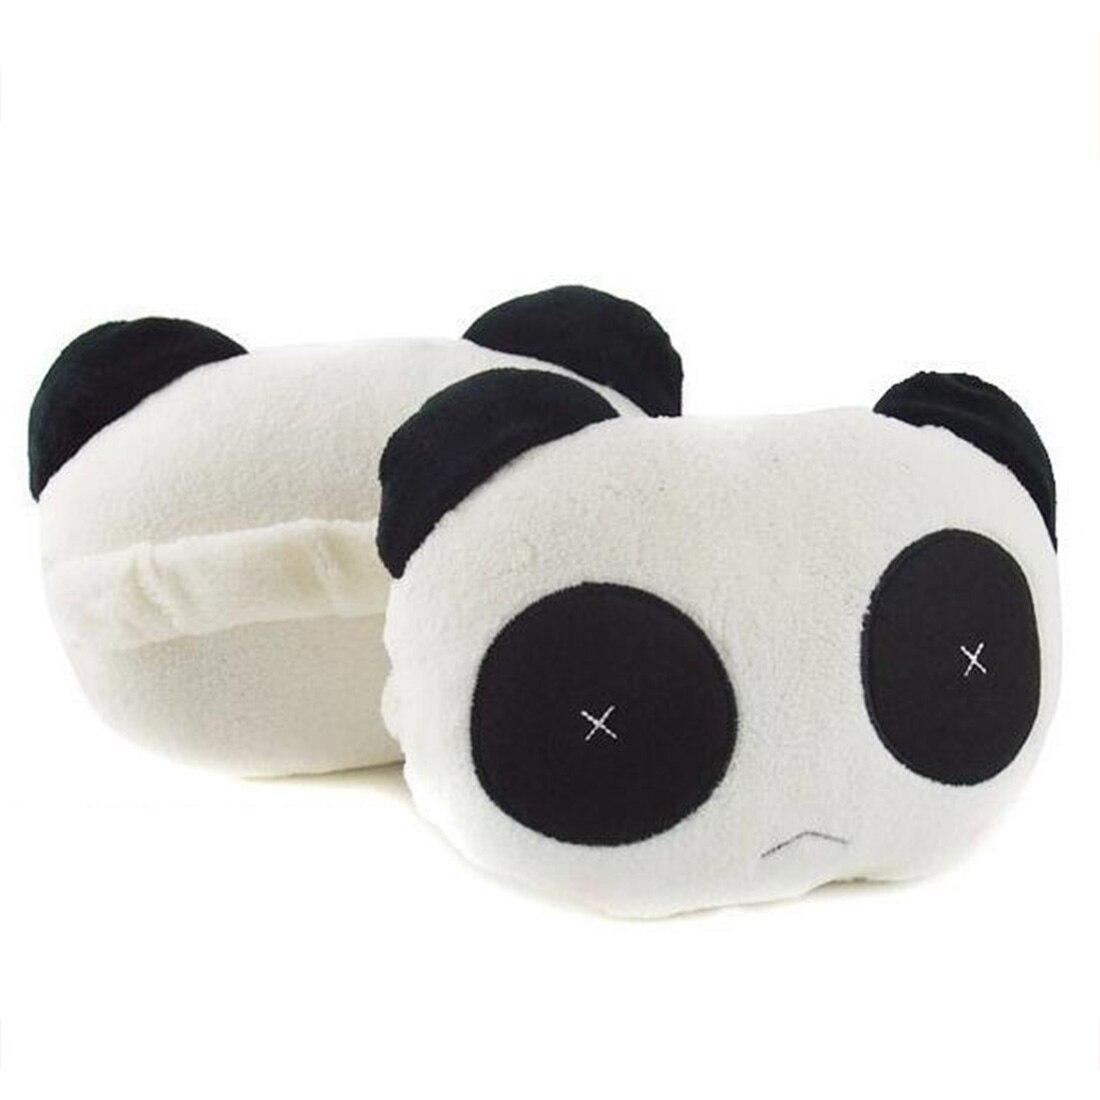 Dewtreetali Cute Cartoon Panda Plush Auto Waist Cushion Car Seat Neck Rest Headrest Pillow